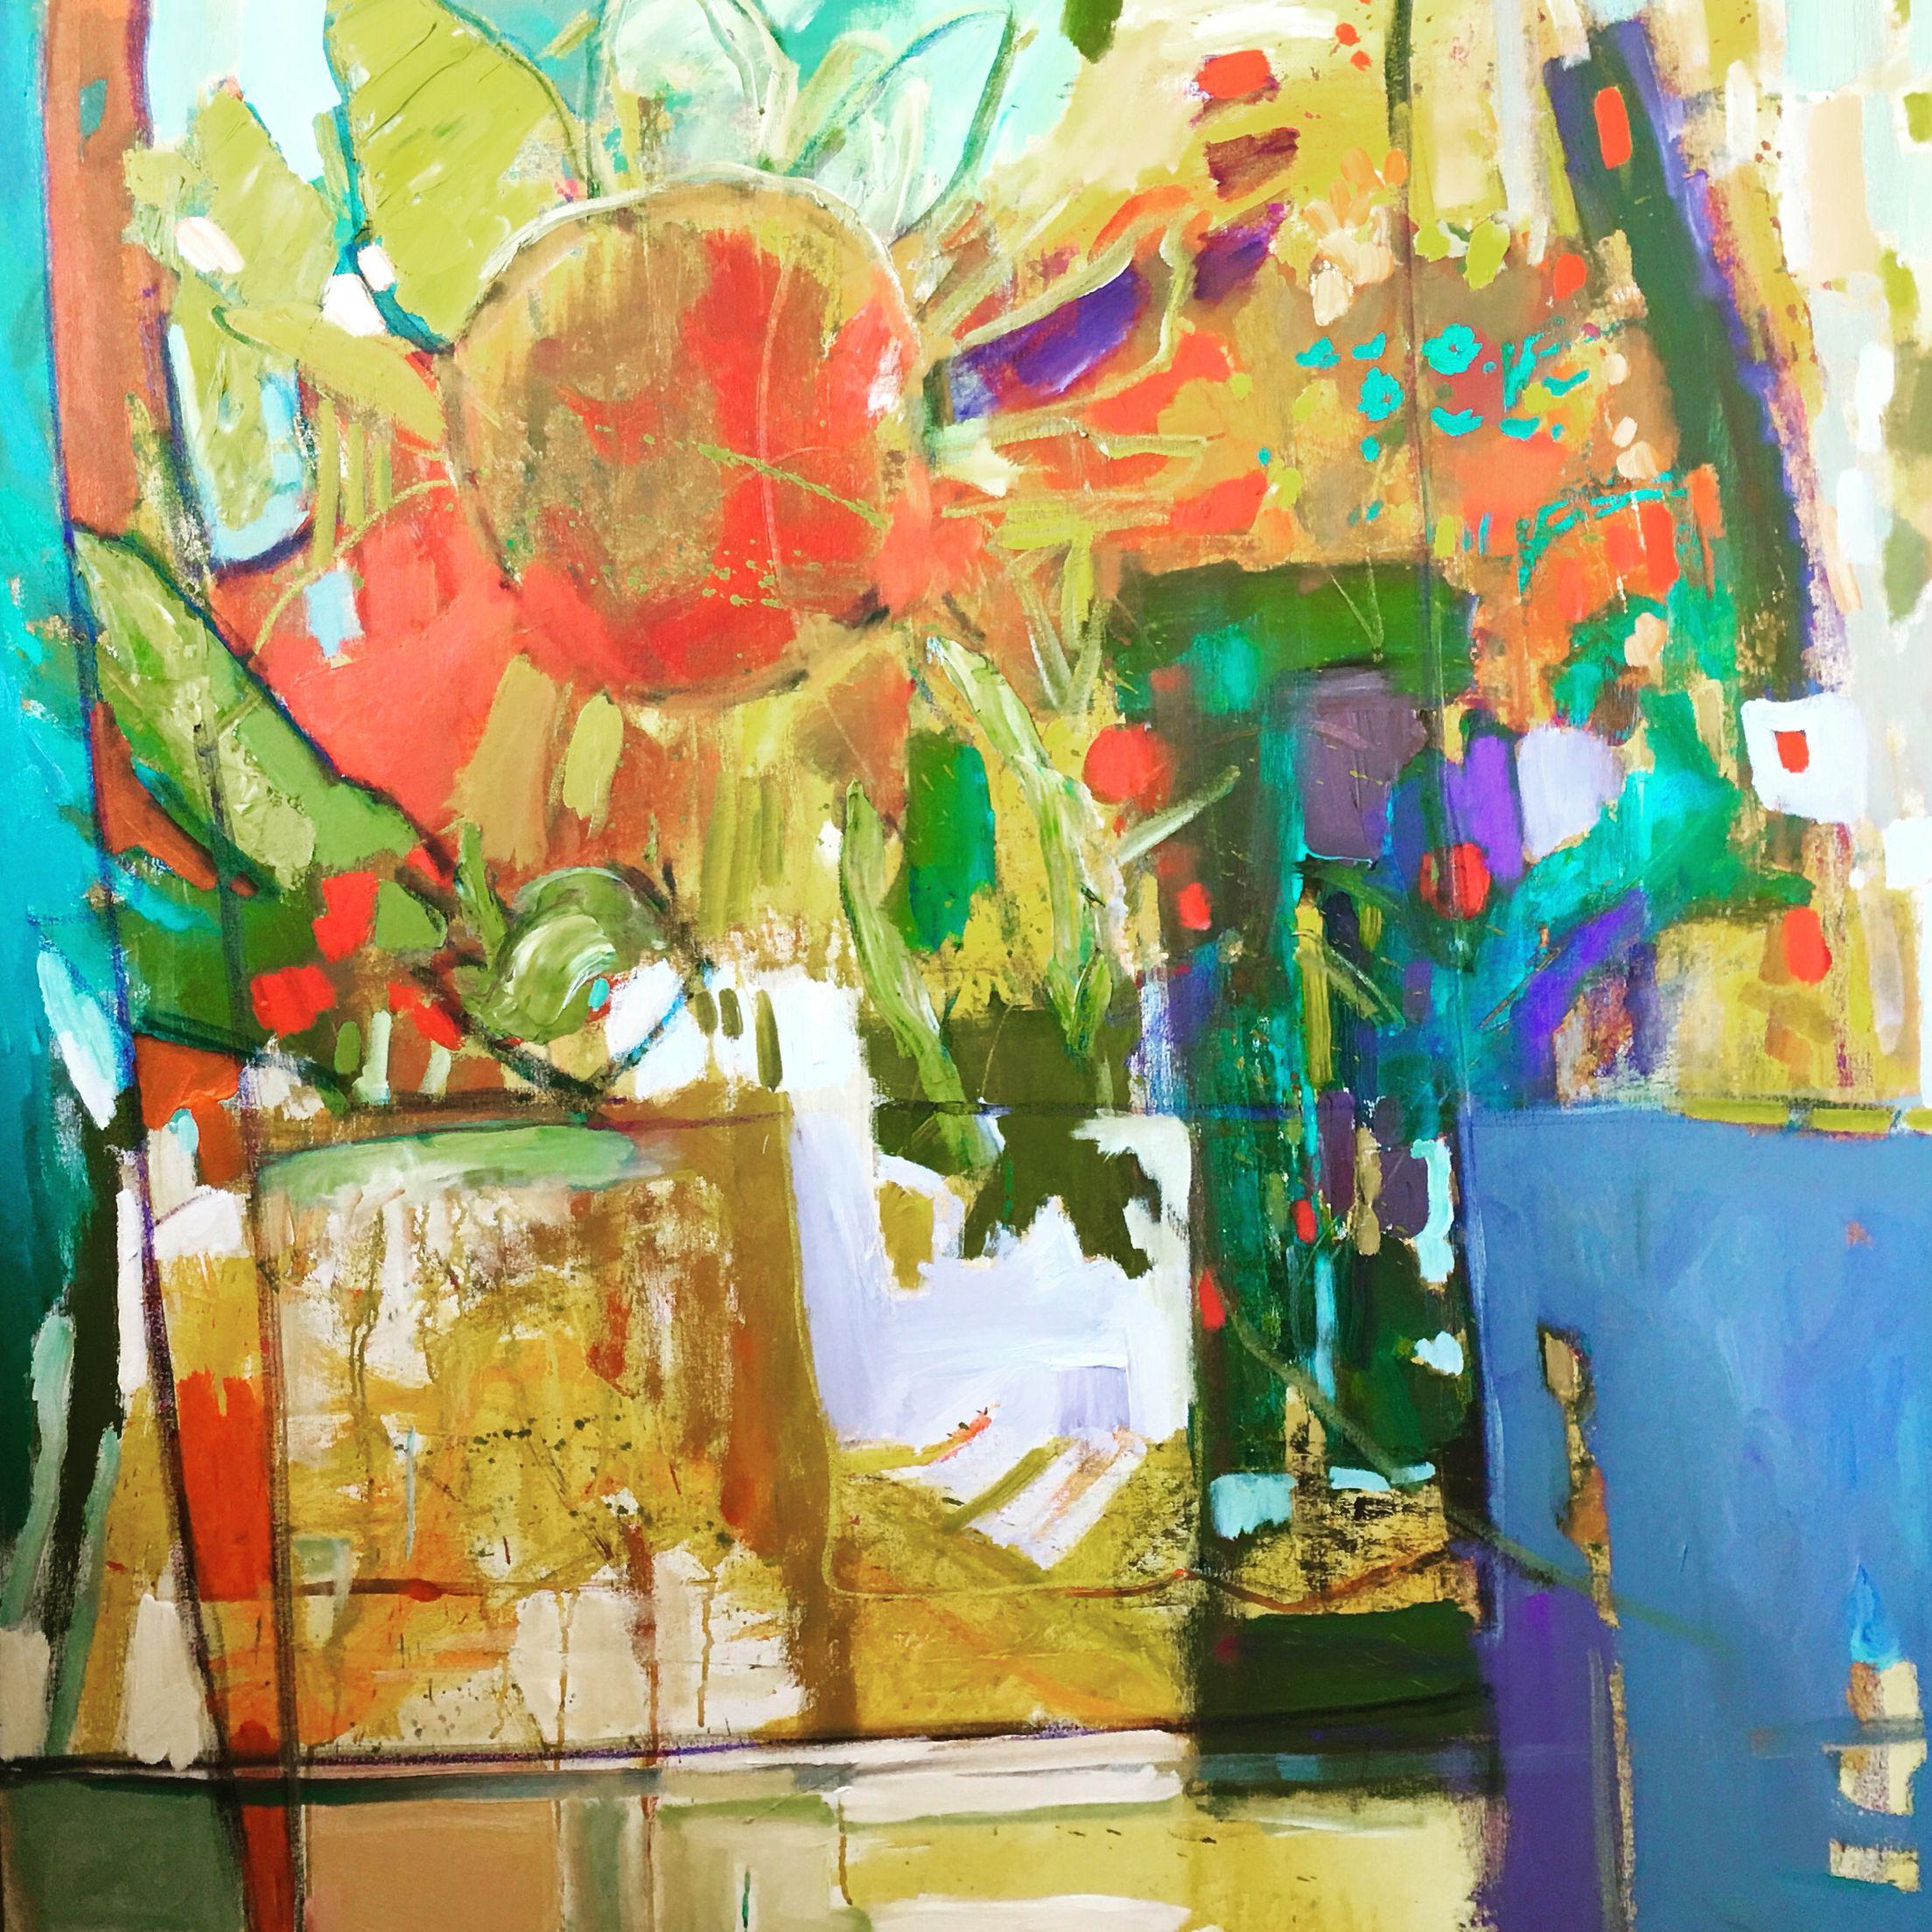 48x48 acrylic mixed media abstract painting painting art